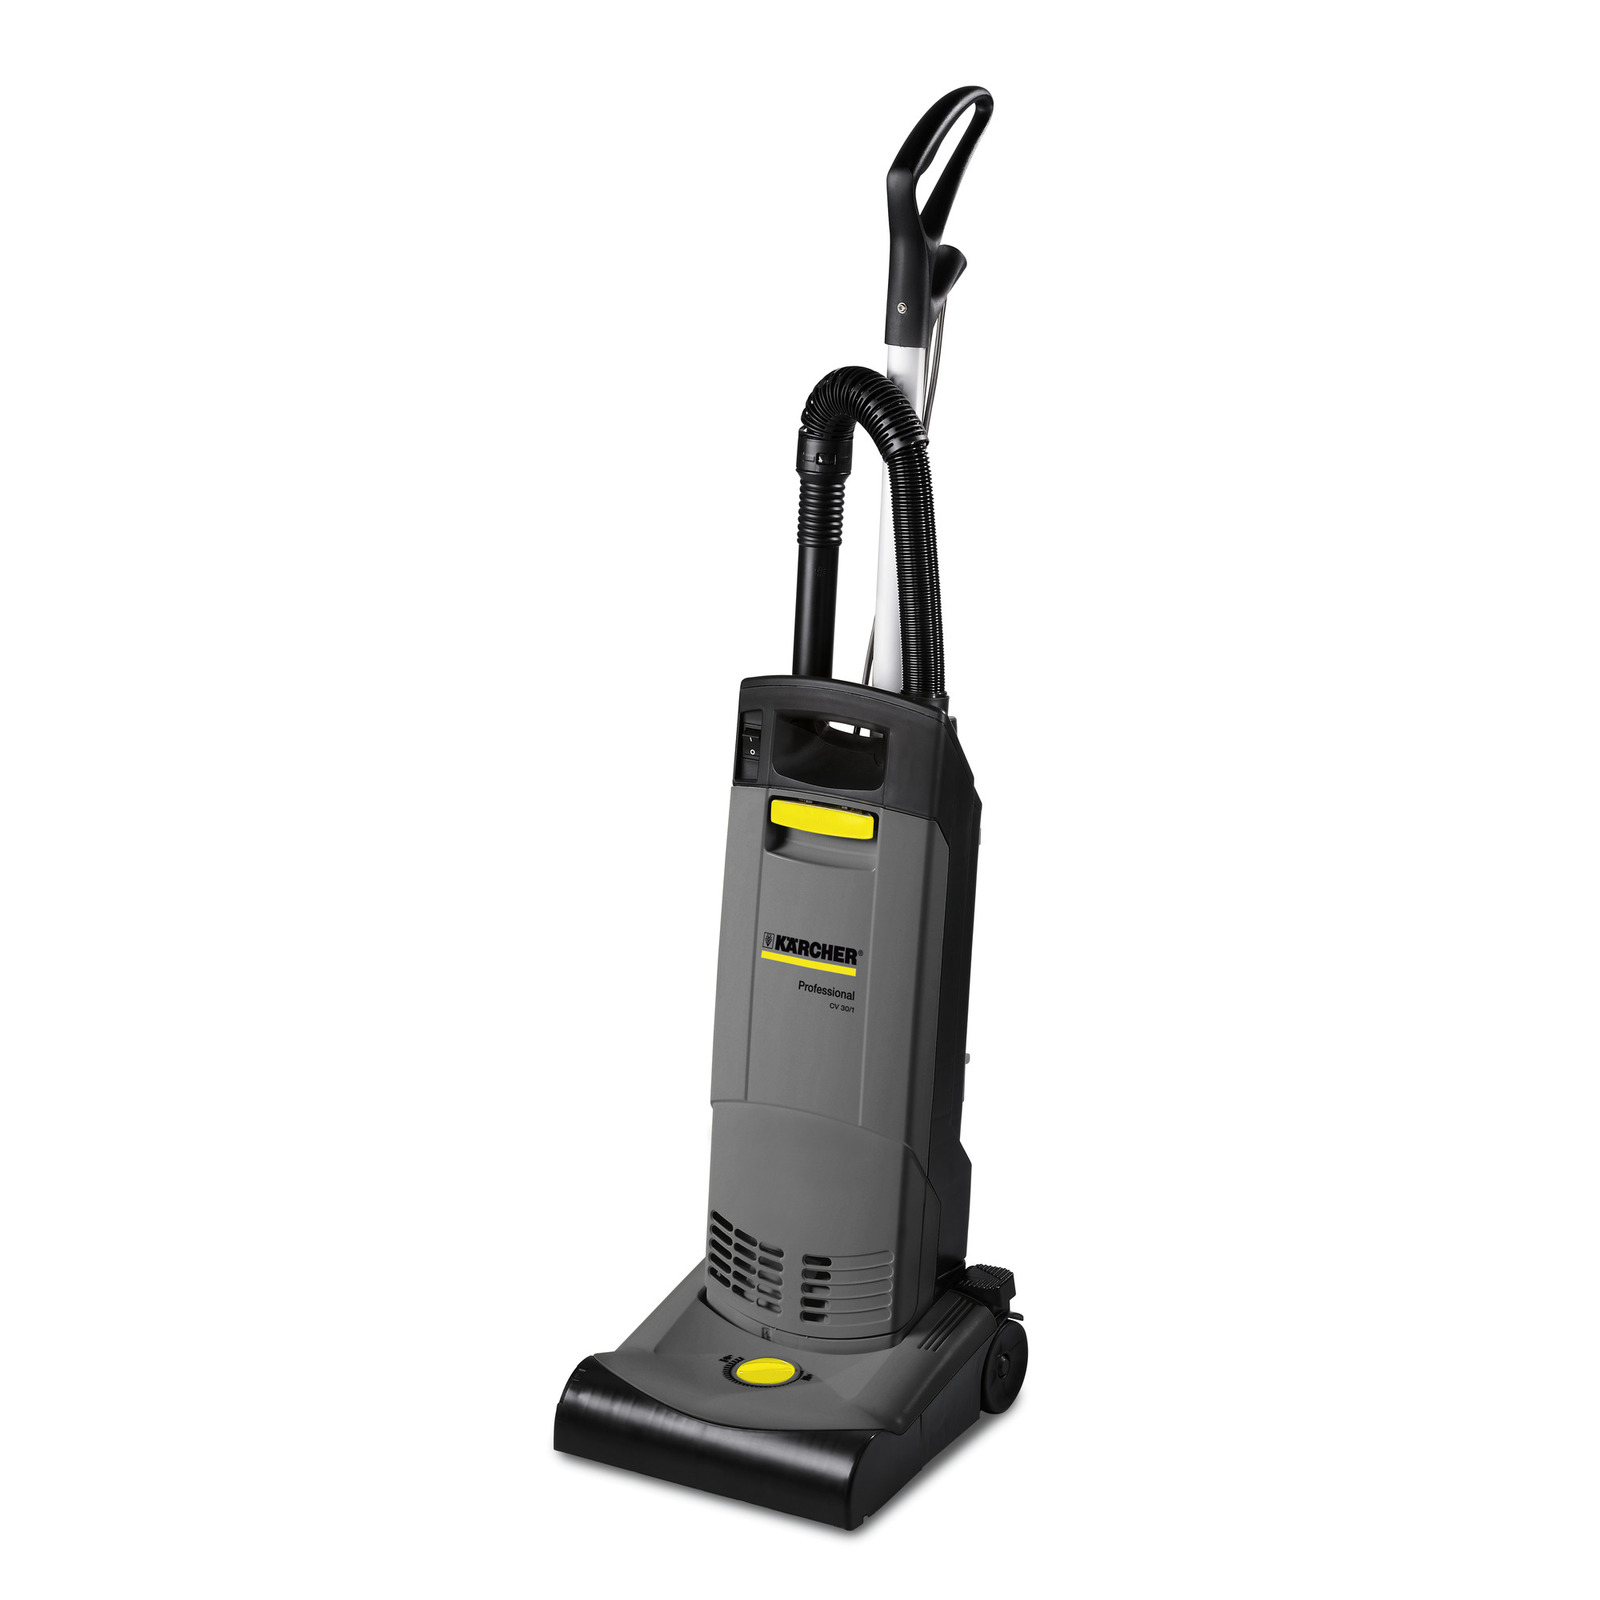 Upright Brush Type Vacuum Cleaner Cv 30 1 K 228 Rcher Uk